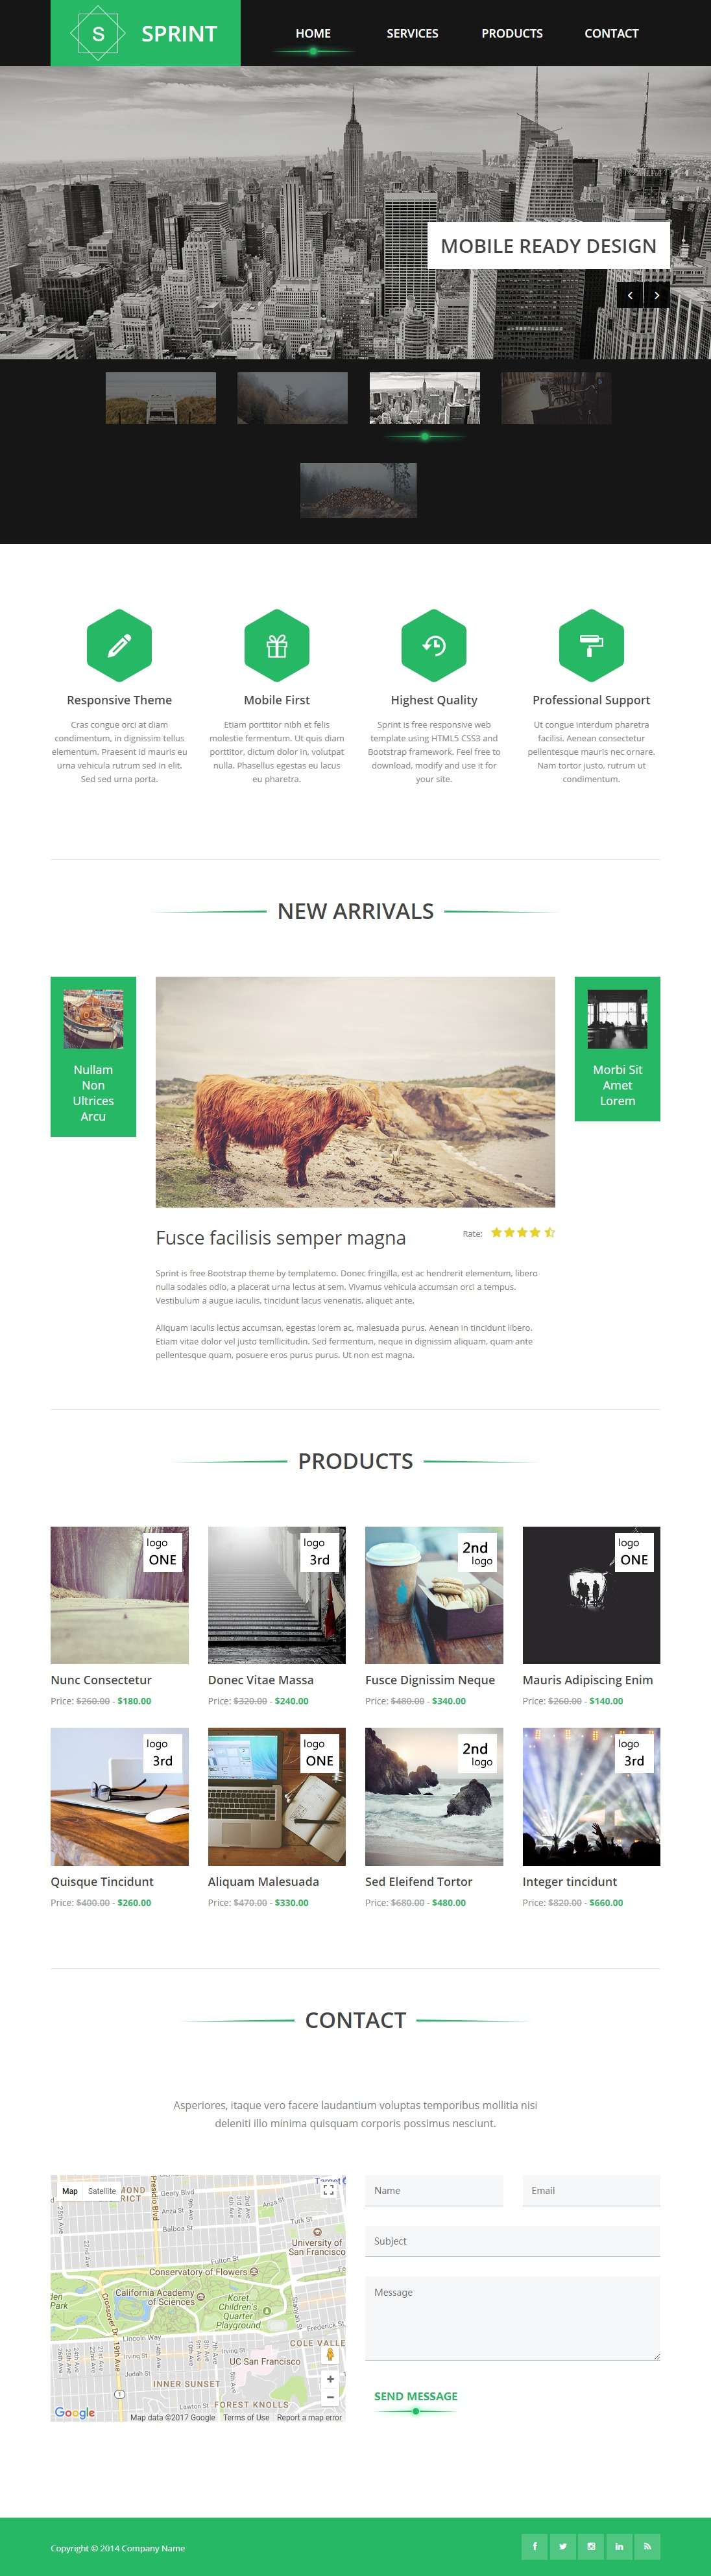 Sprint-Bootstrap-Website-Design